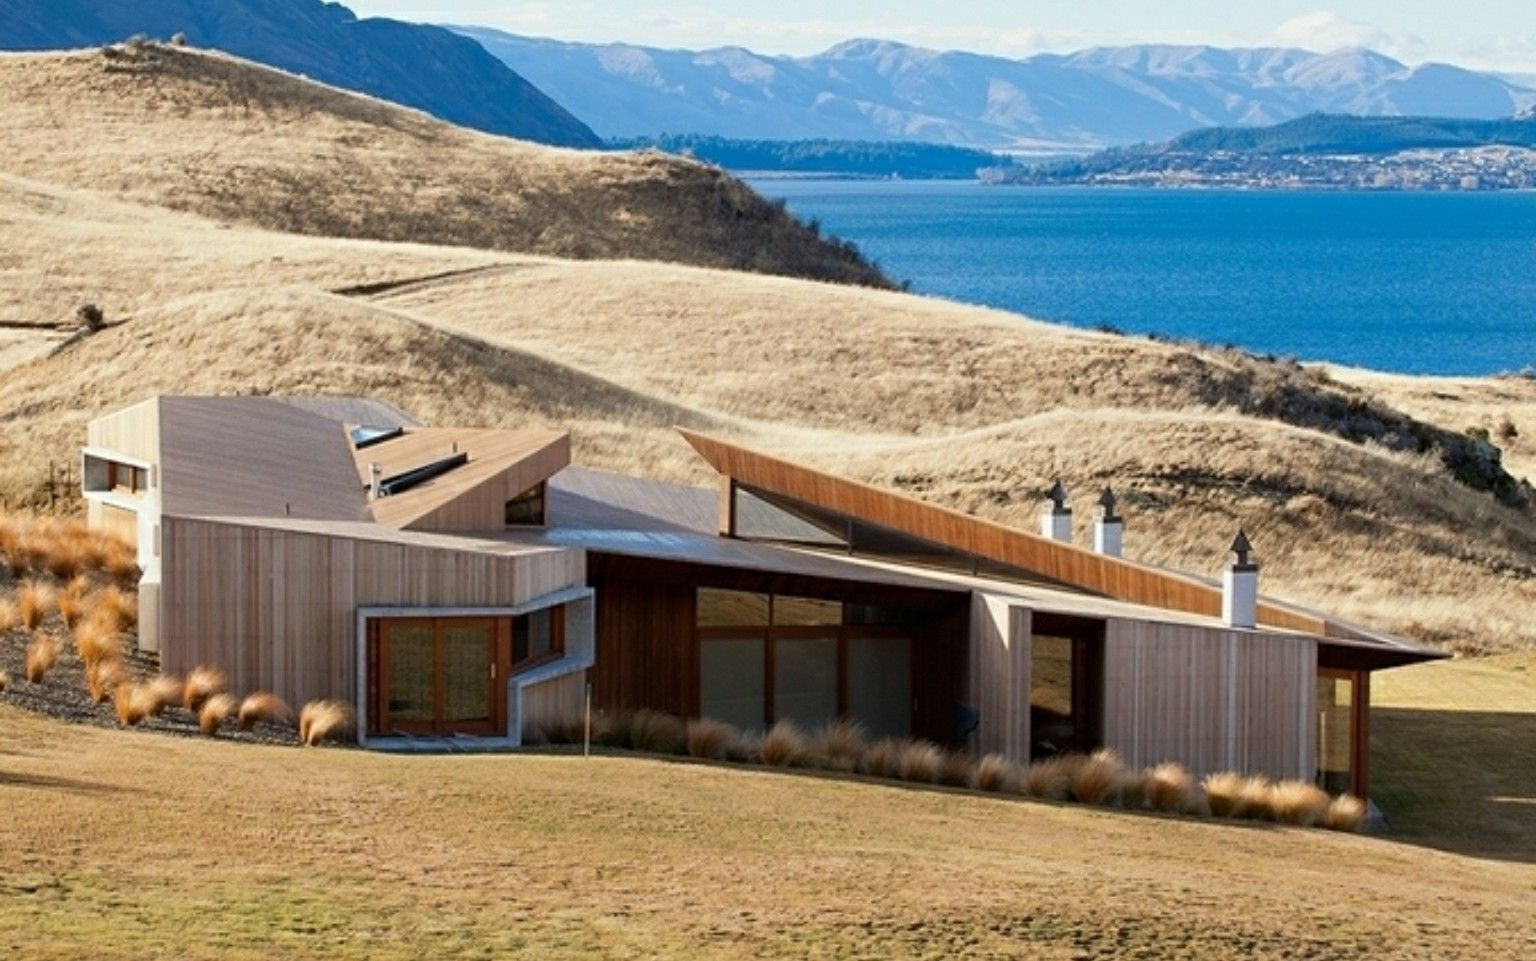 Te Kaitaka House Stevens Lawson Architects Nova Zelandia Architecture New Zealand Houses Holiday Home